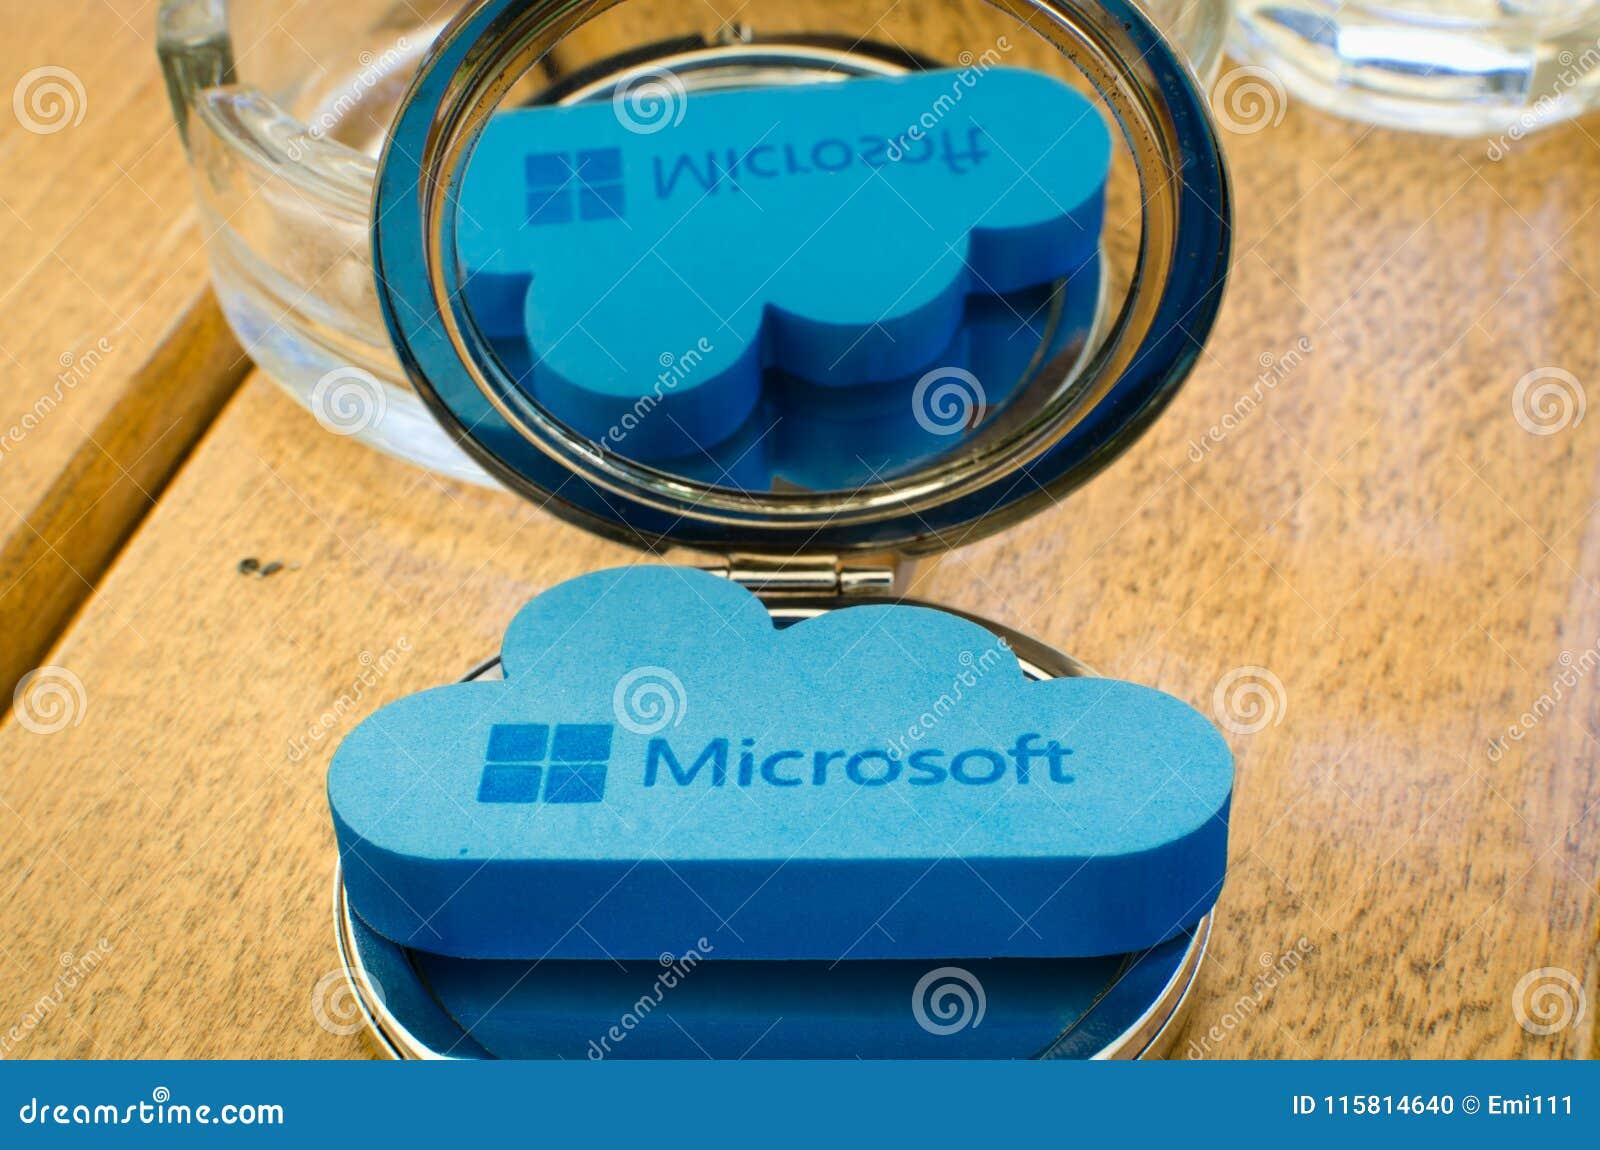 Ronde Houten Spiegel : Pictogram microsoft windows onedrive op kleine ronde spiegel met